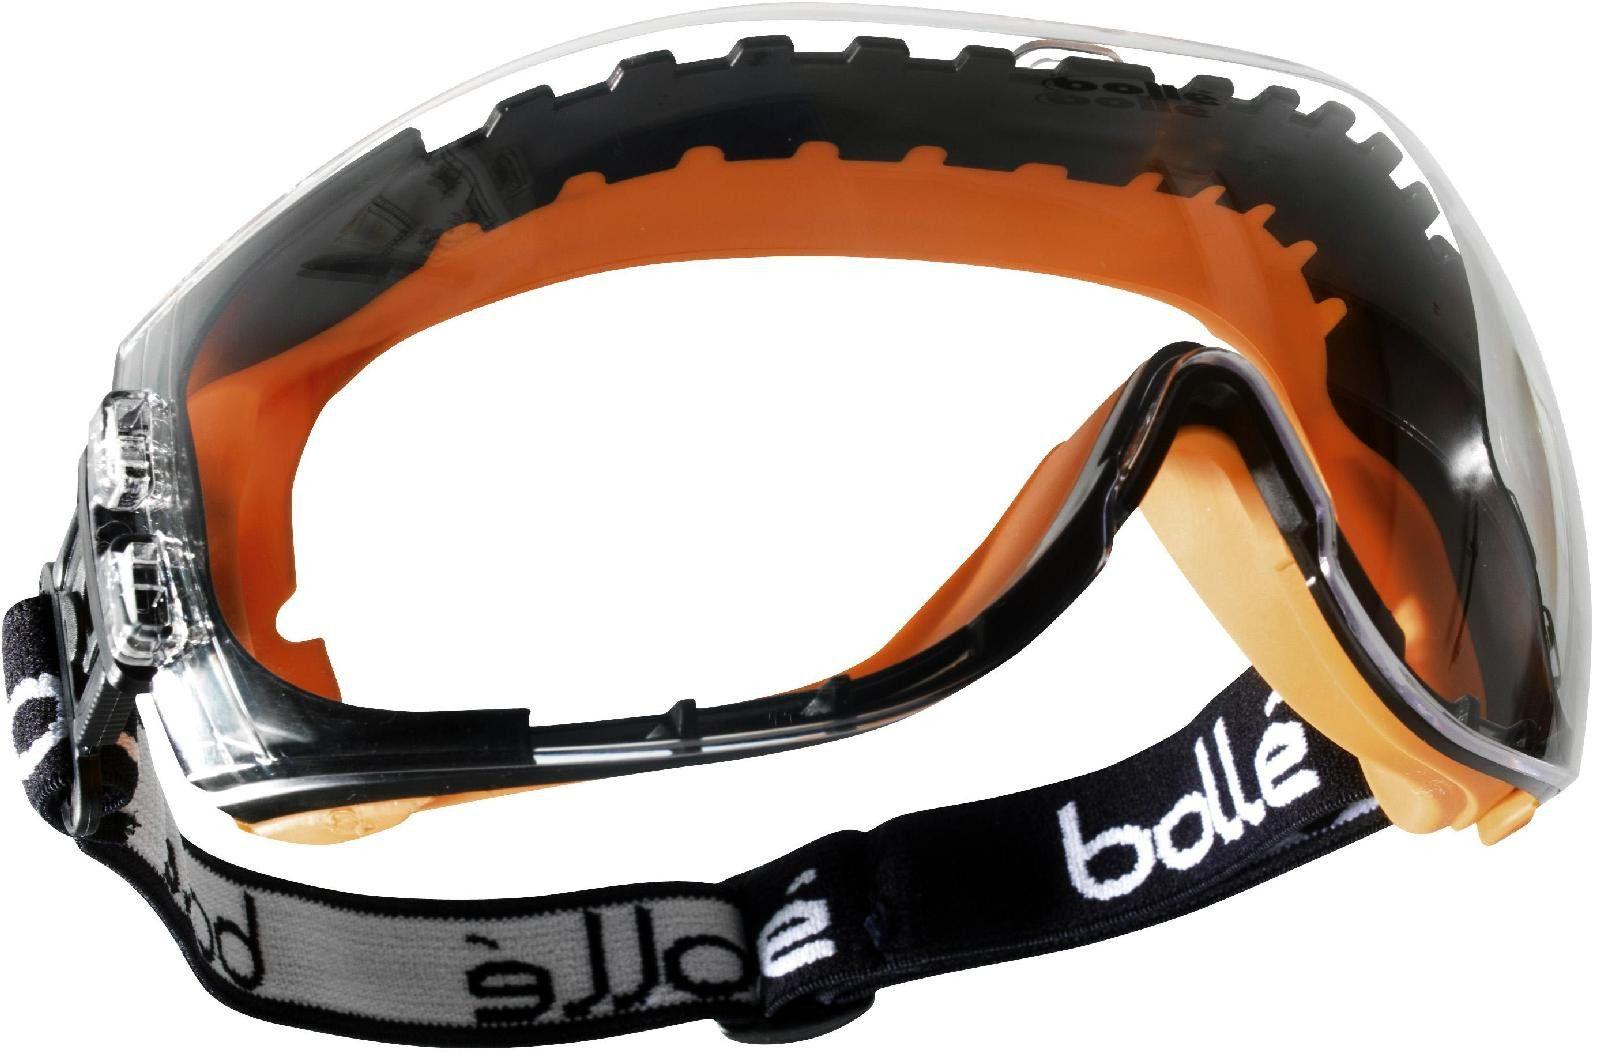 BOLPILOPSI Bolle Pilot Clear Safety Goggles Anti Mist